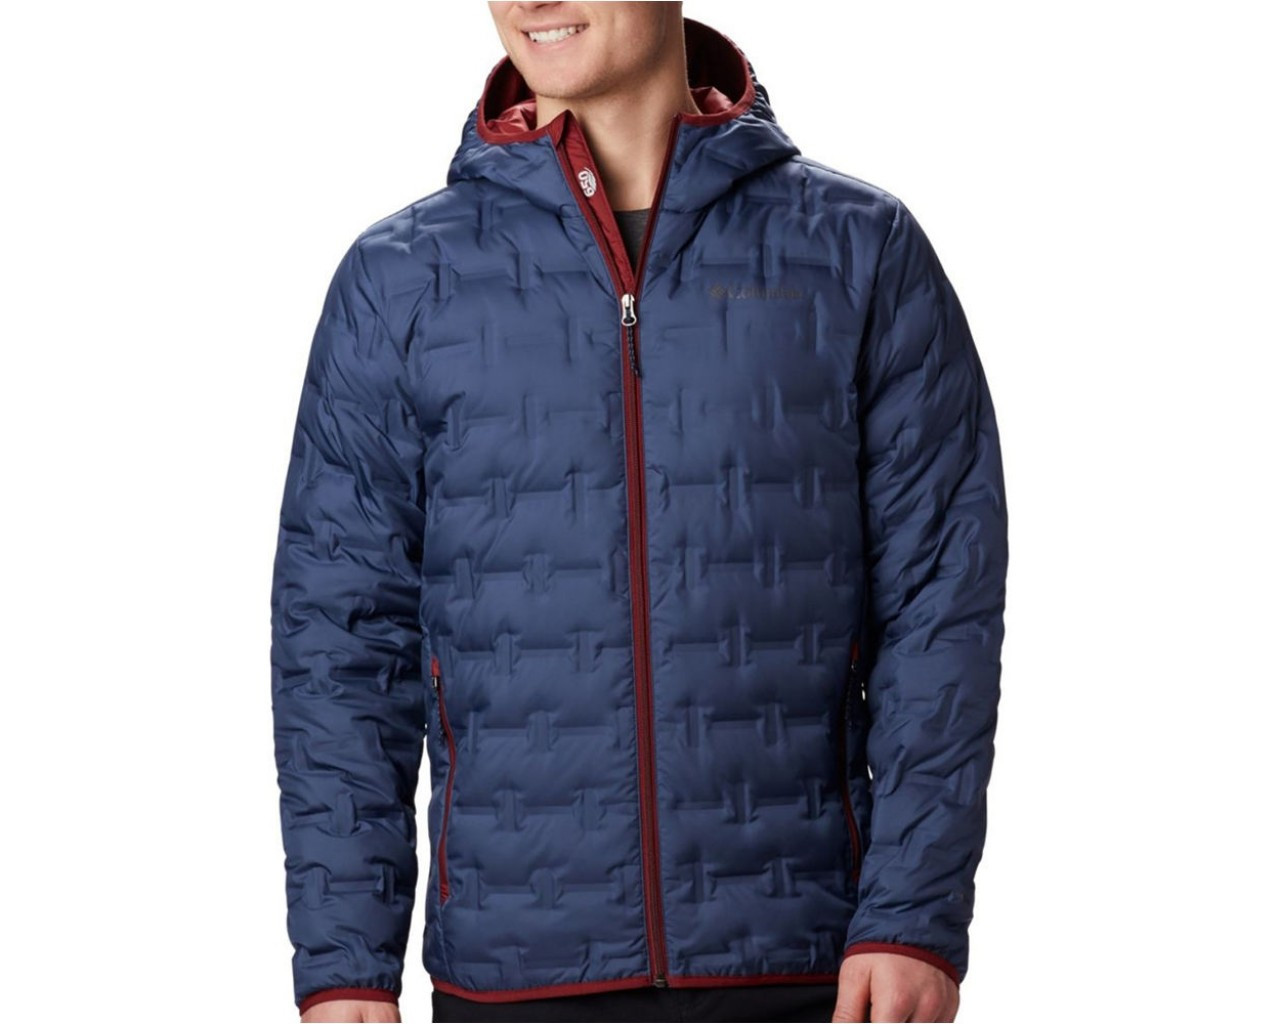 Куртка пуховая мужская Columbia DELTA RIDGE